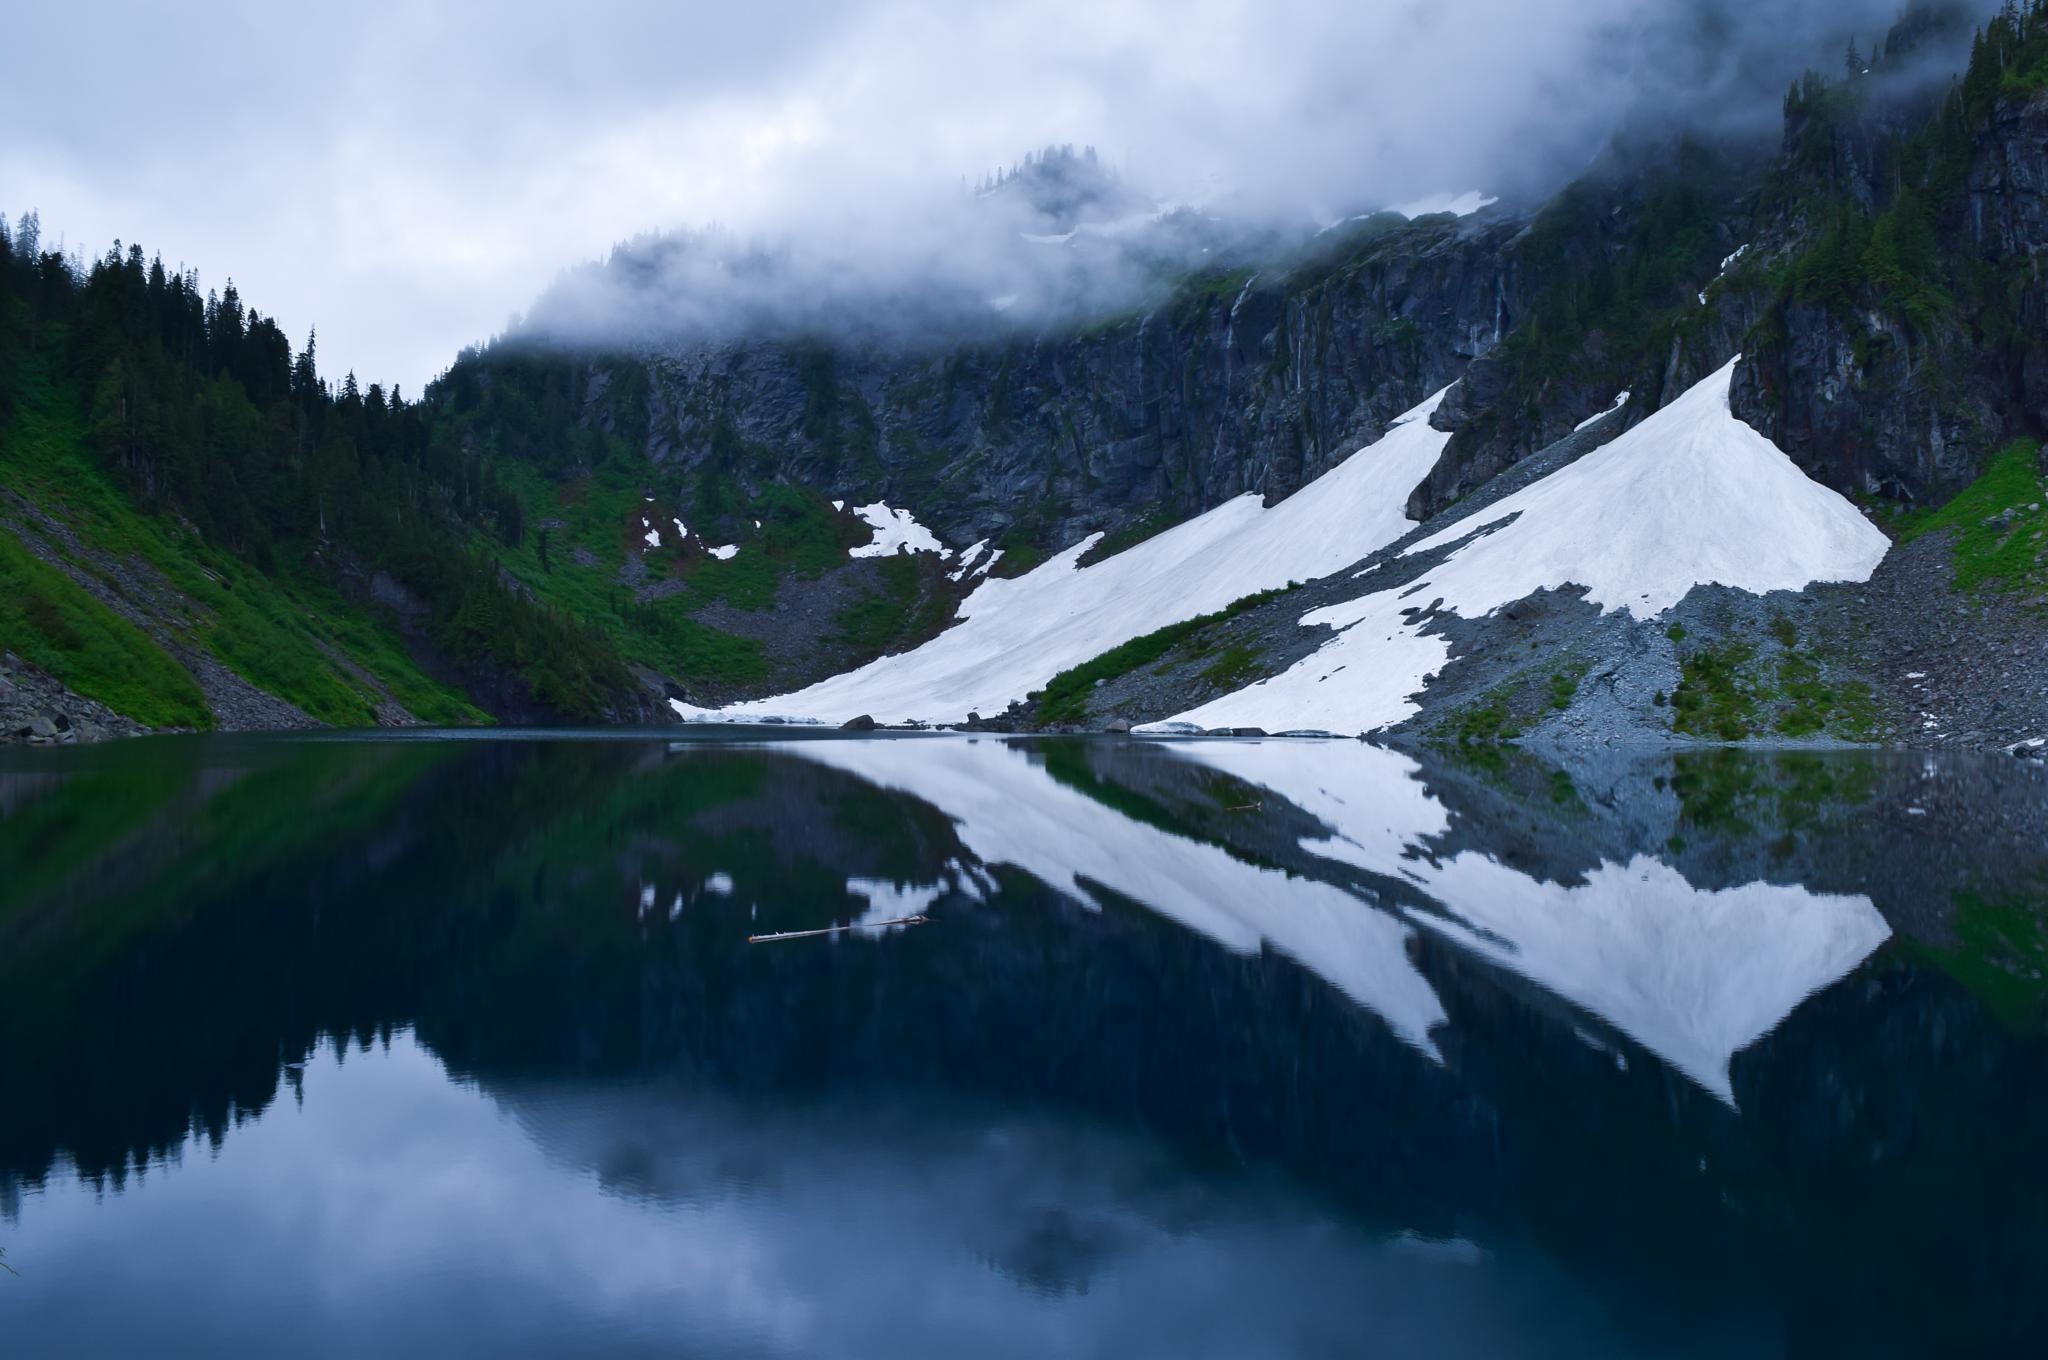 Lake Serene by Dave Cornelison